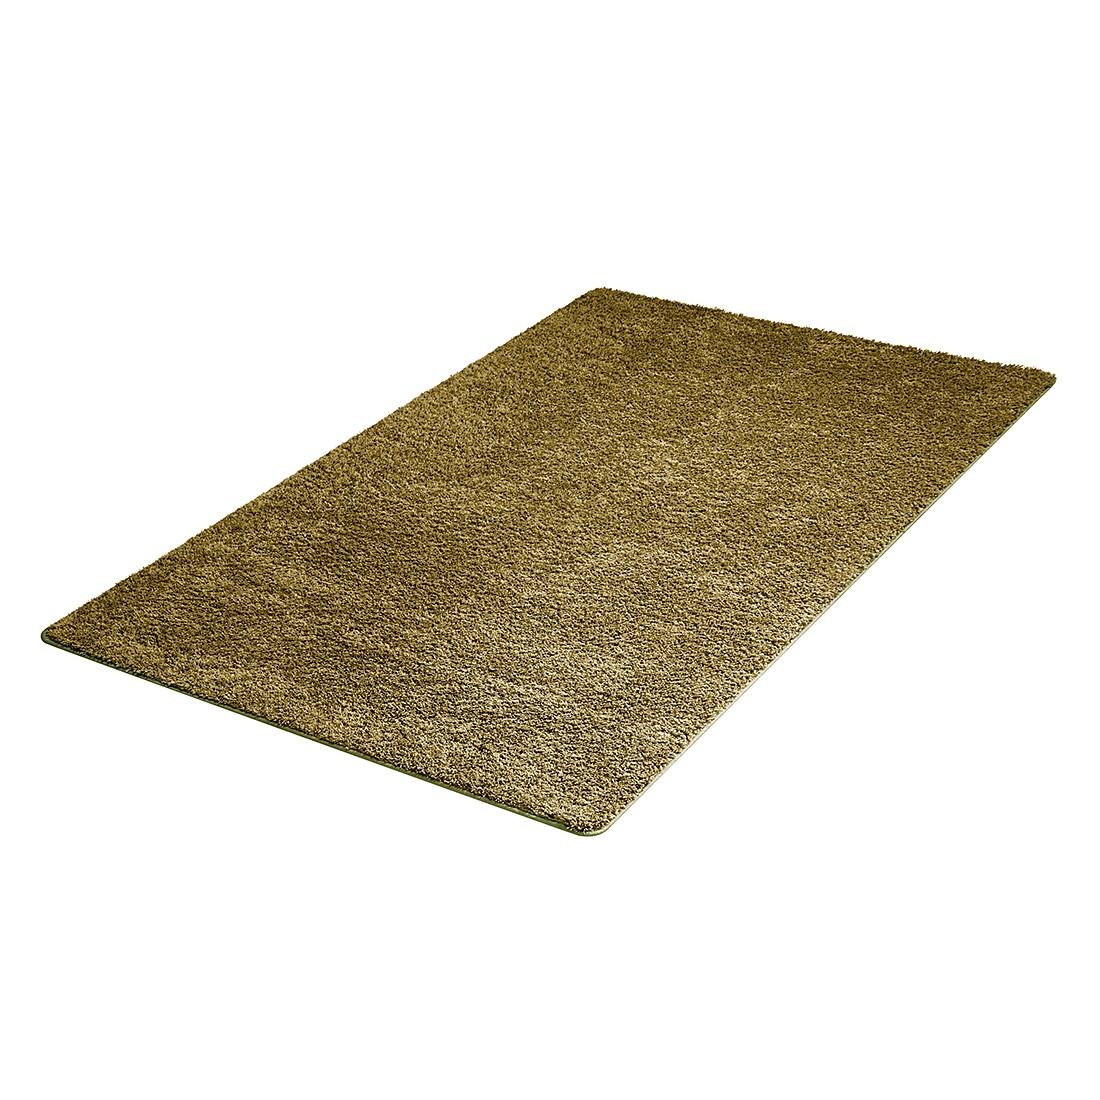 Teppich Noblesse Classic – Grün – 80 x 160 cm, DEKOWE online bestellen